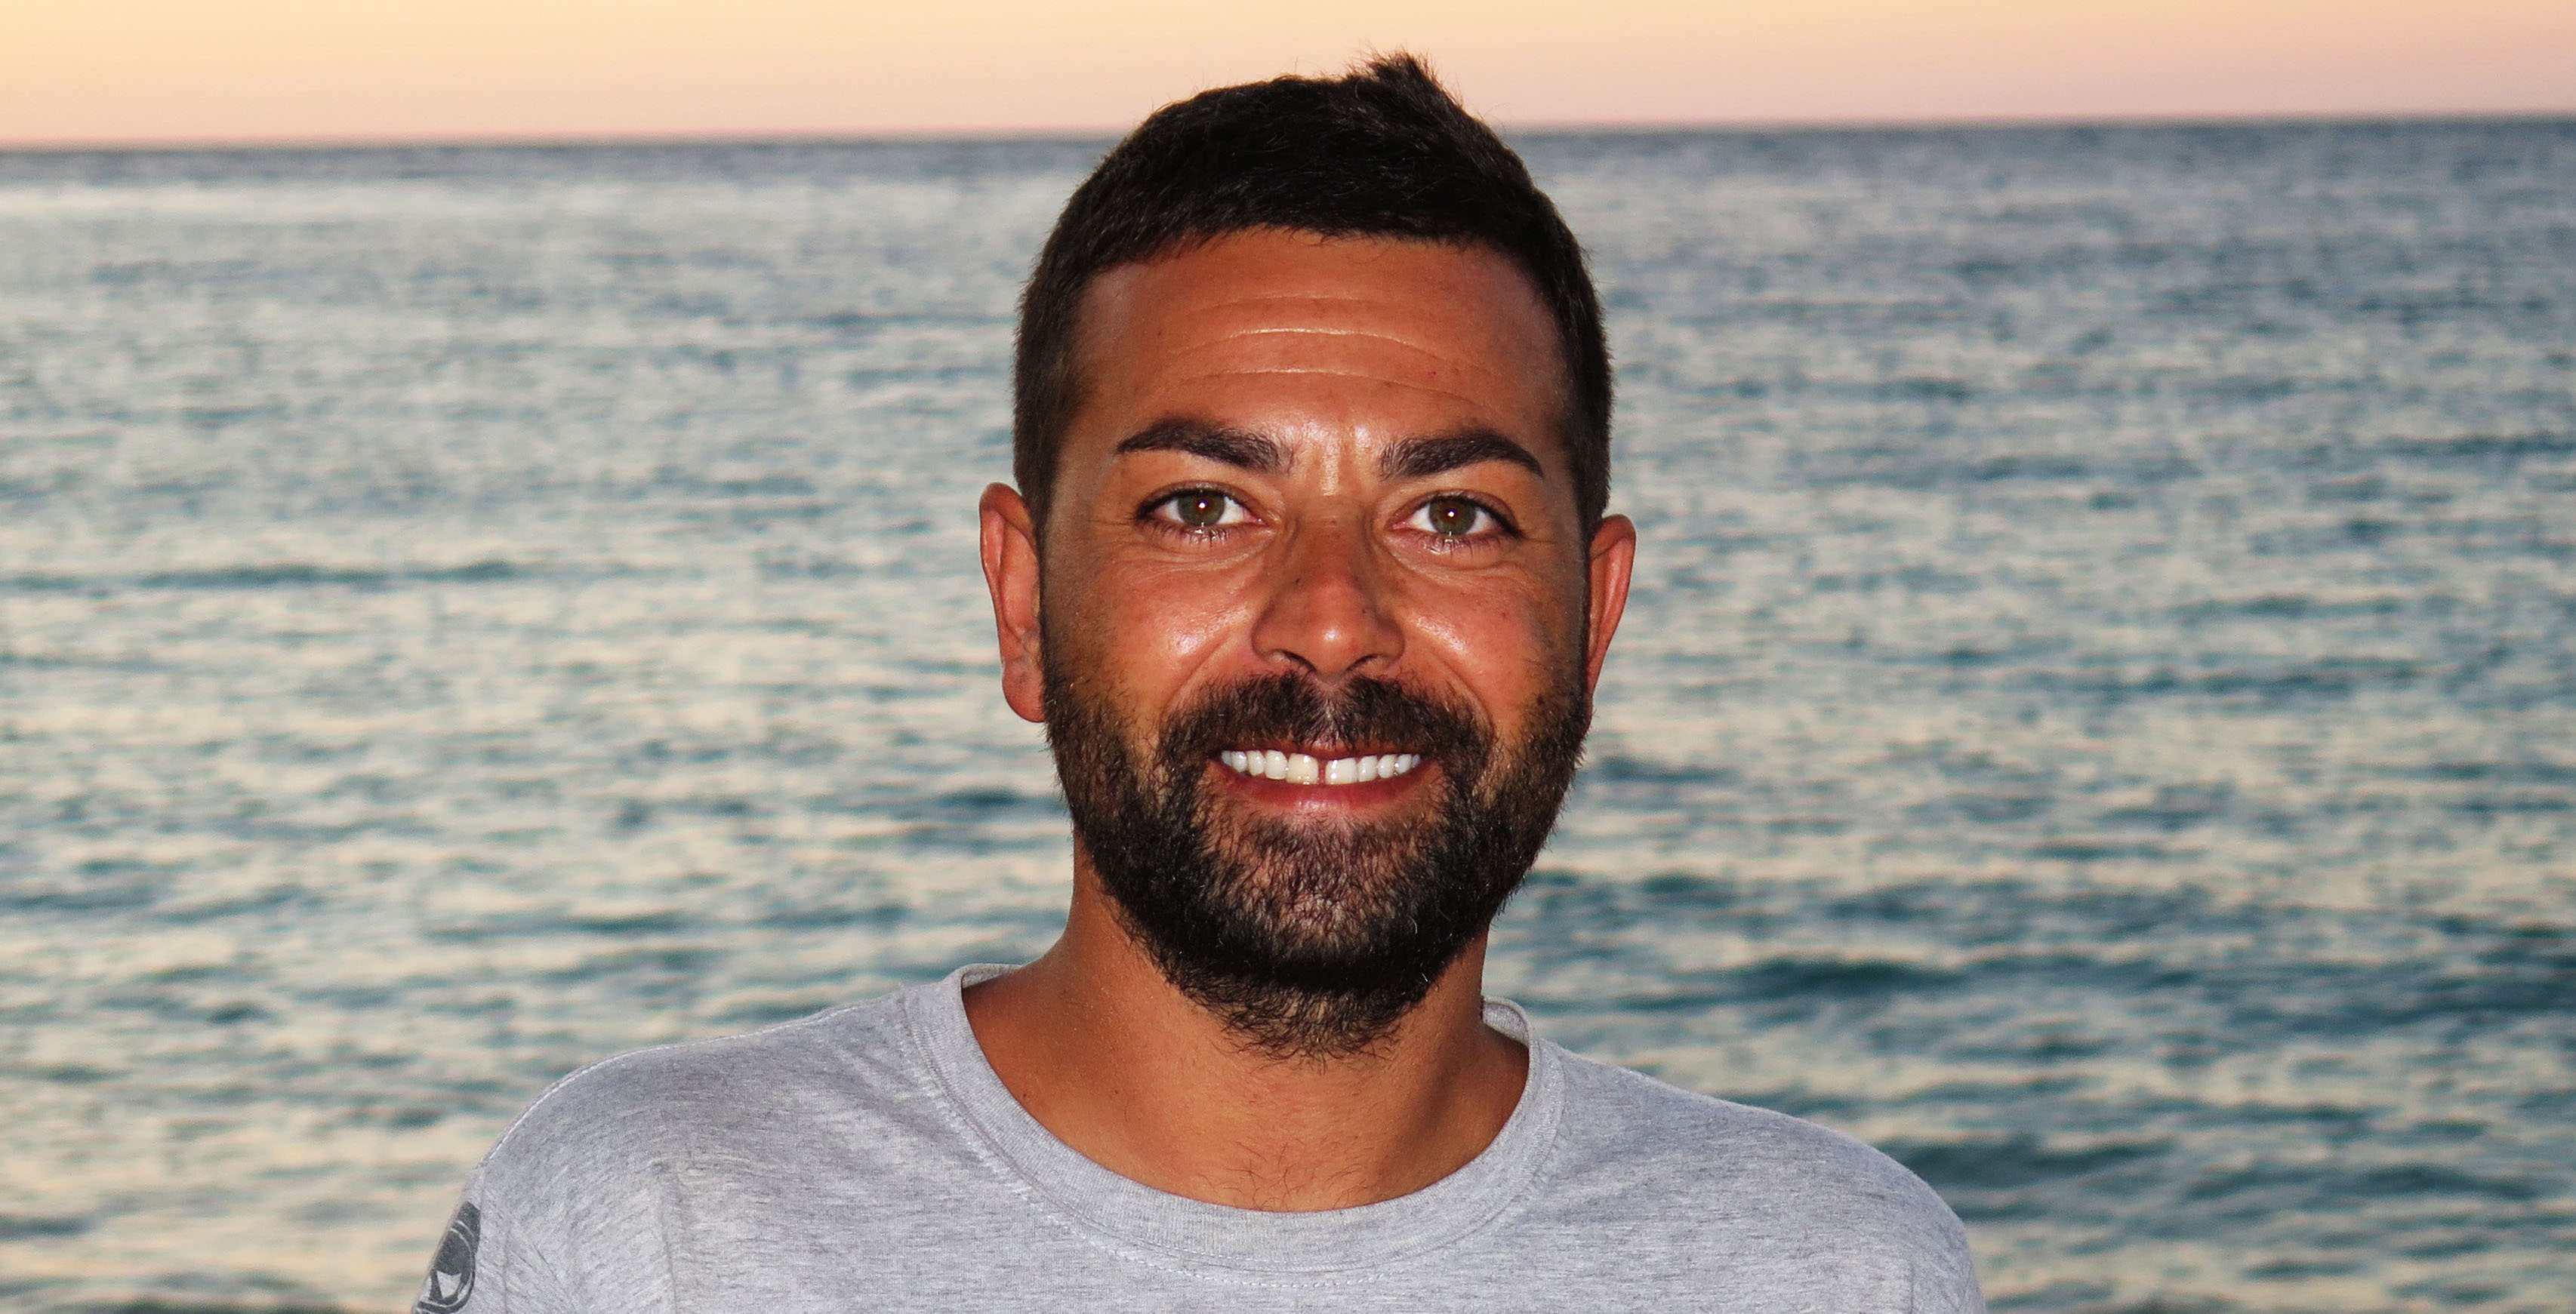 Emanuele Venanzi